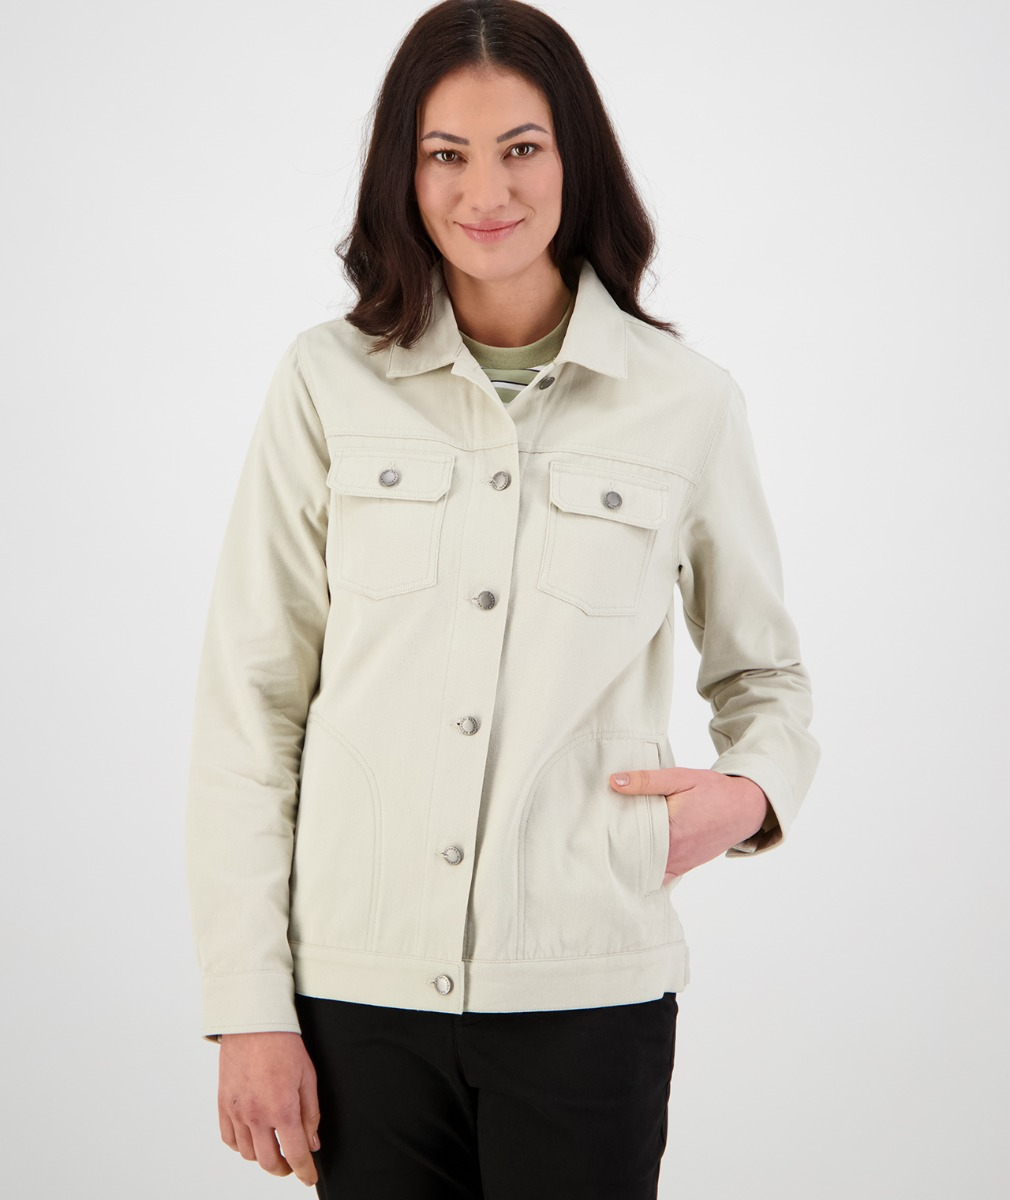 Swanndri Women's Topanga Canyon Trucker Jacket in Stone